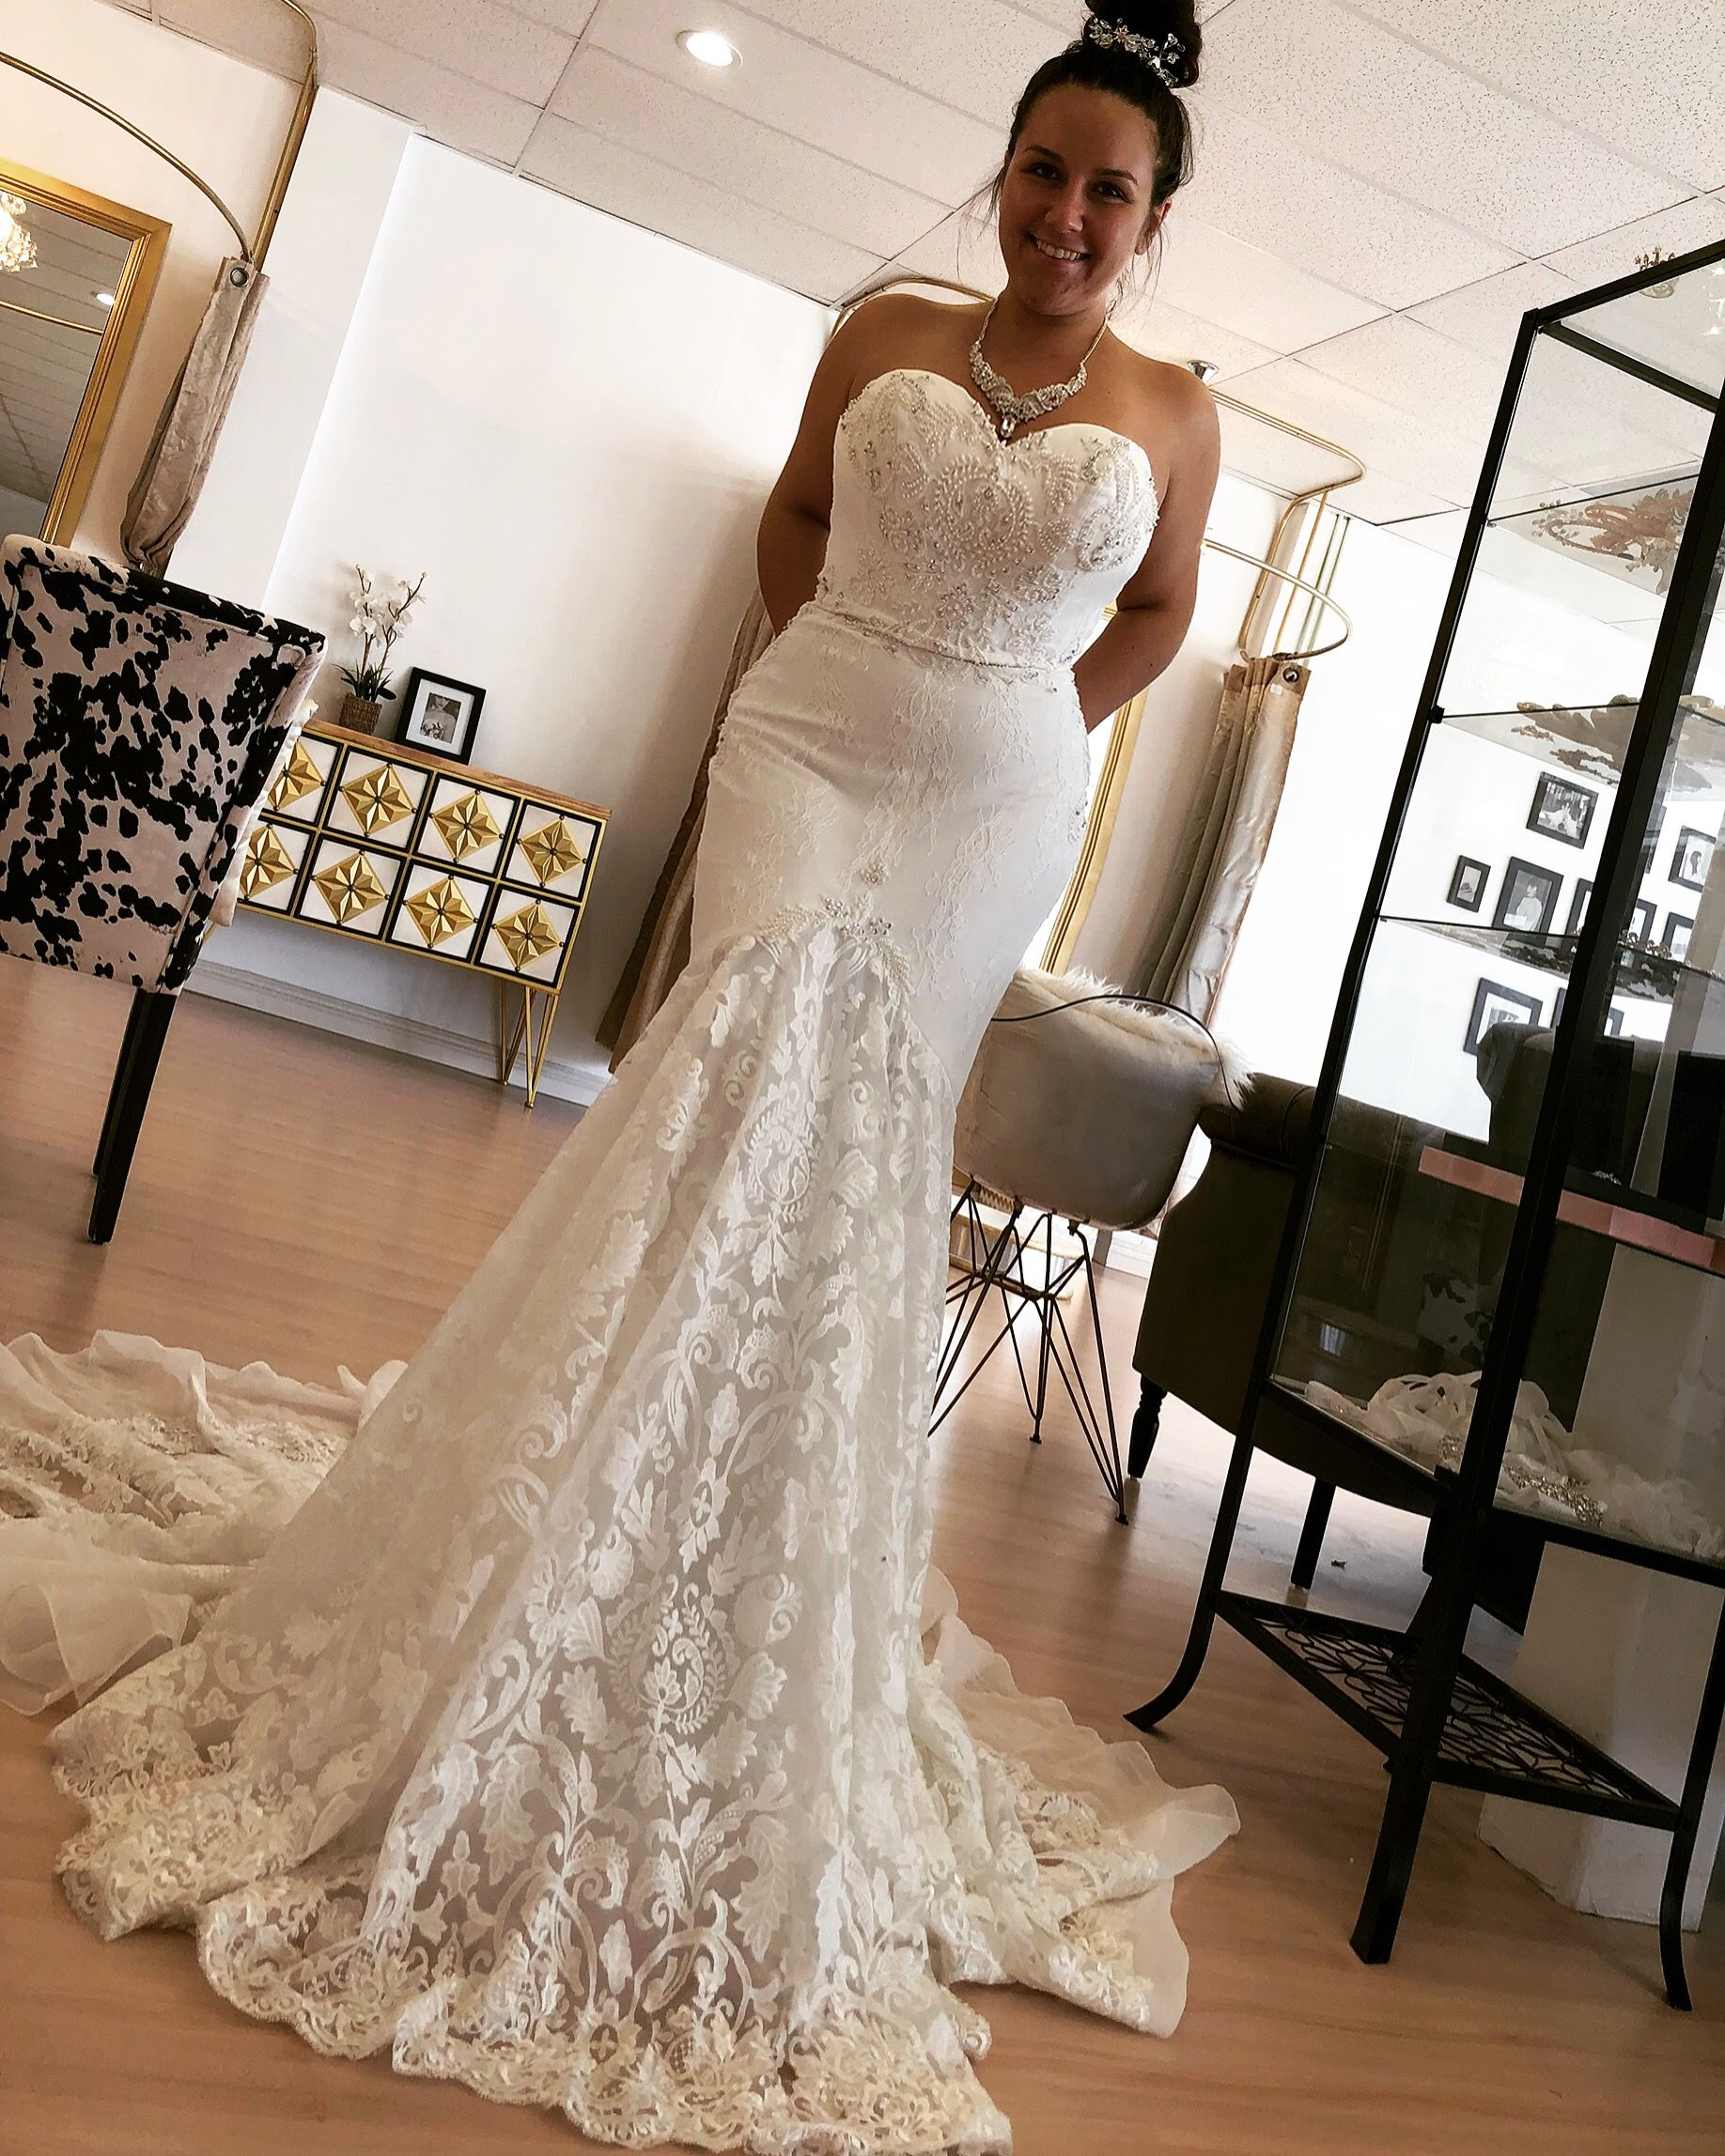 Lacy Mermaid Dress Wedding Dresses Bridal Wedding Dresses Bridal Dresses